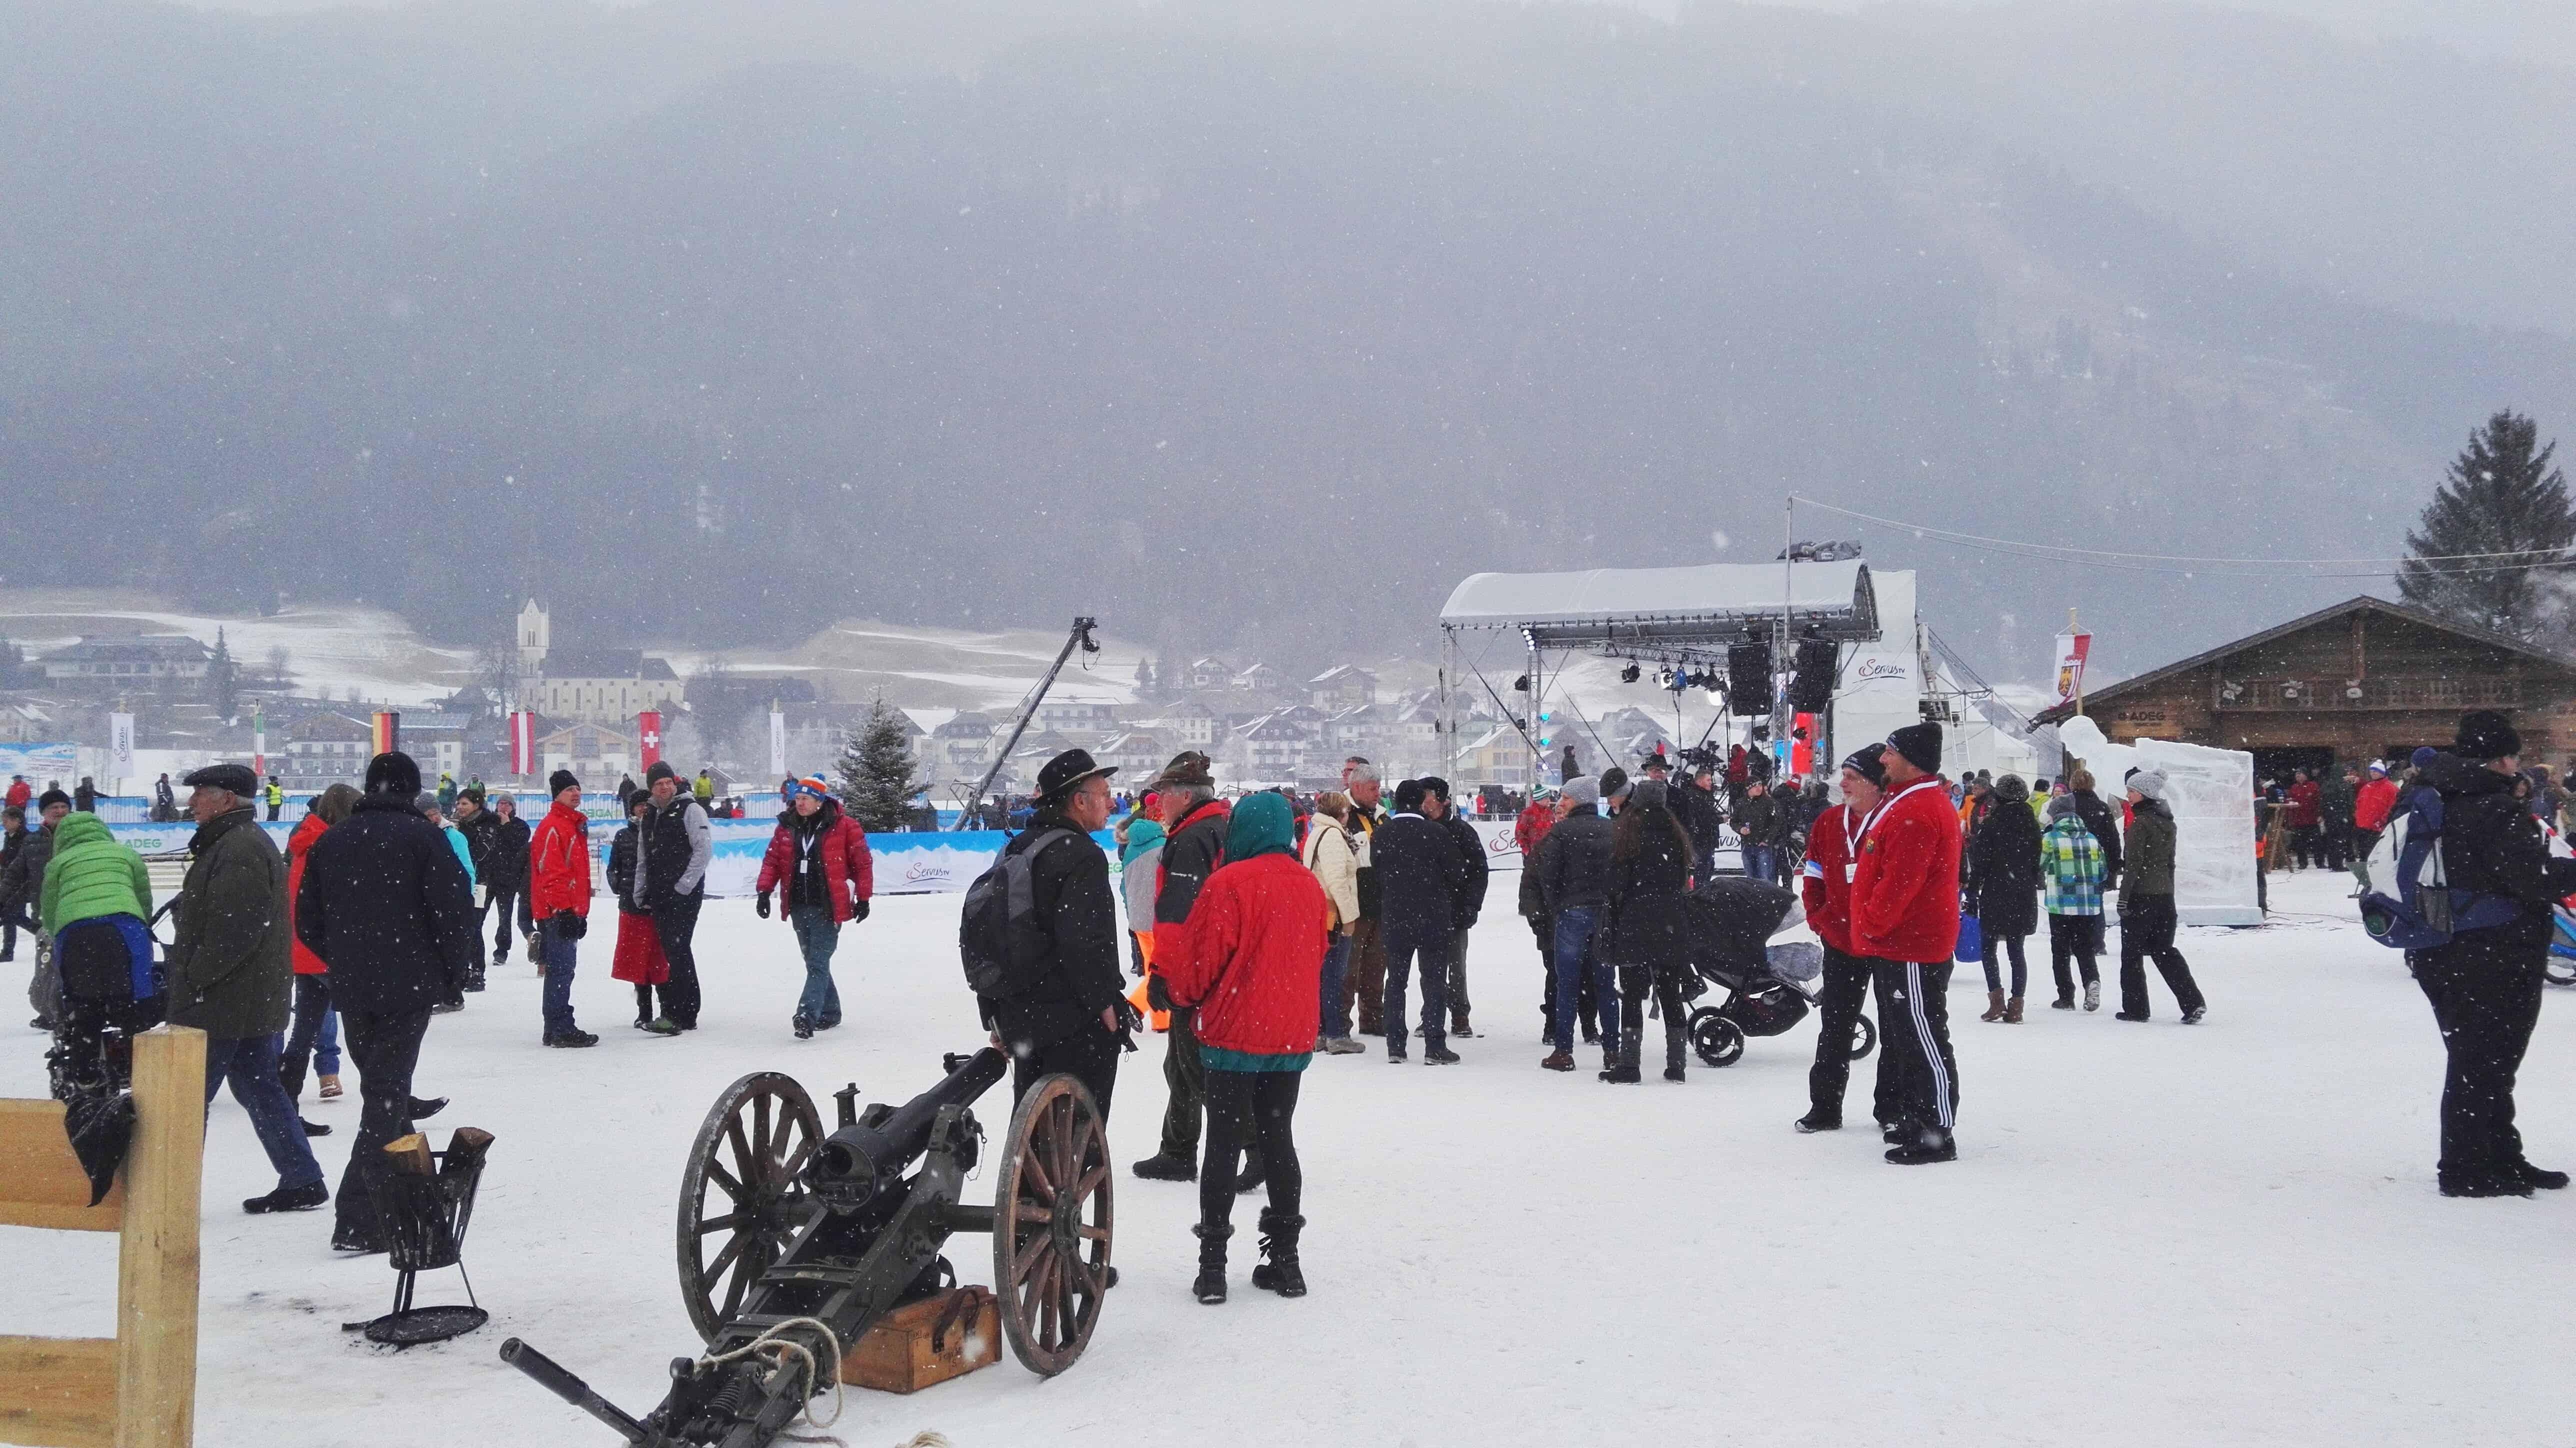 alpenpokal 7 - Servus Alpenpokal